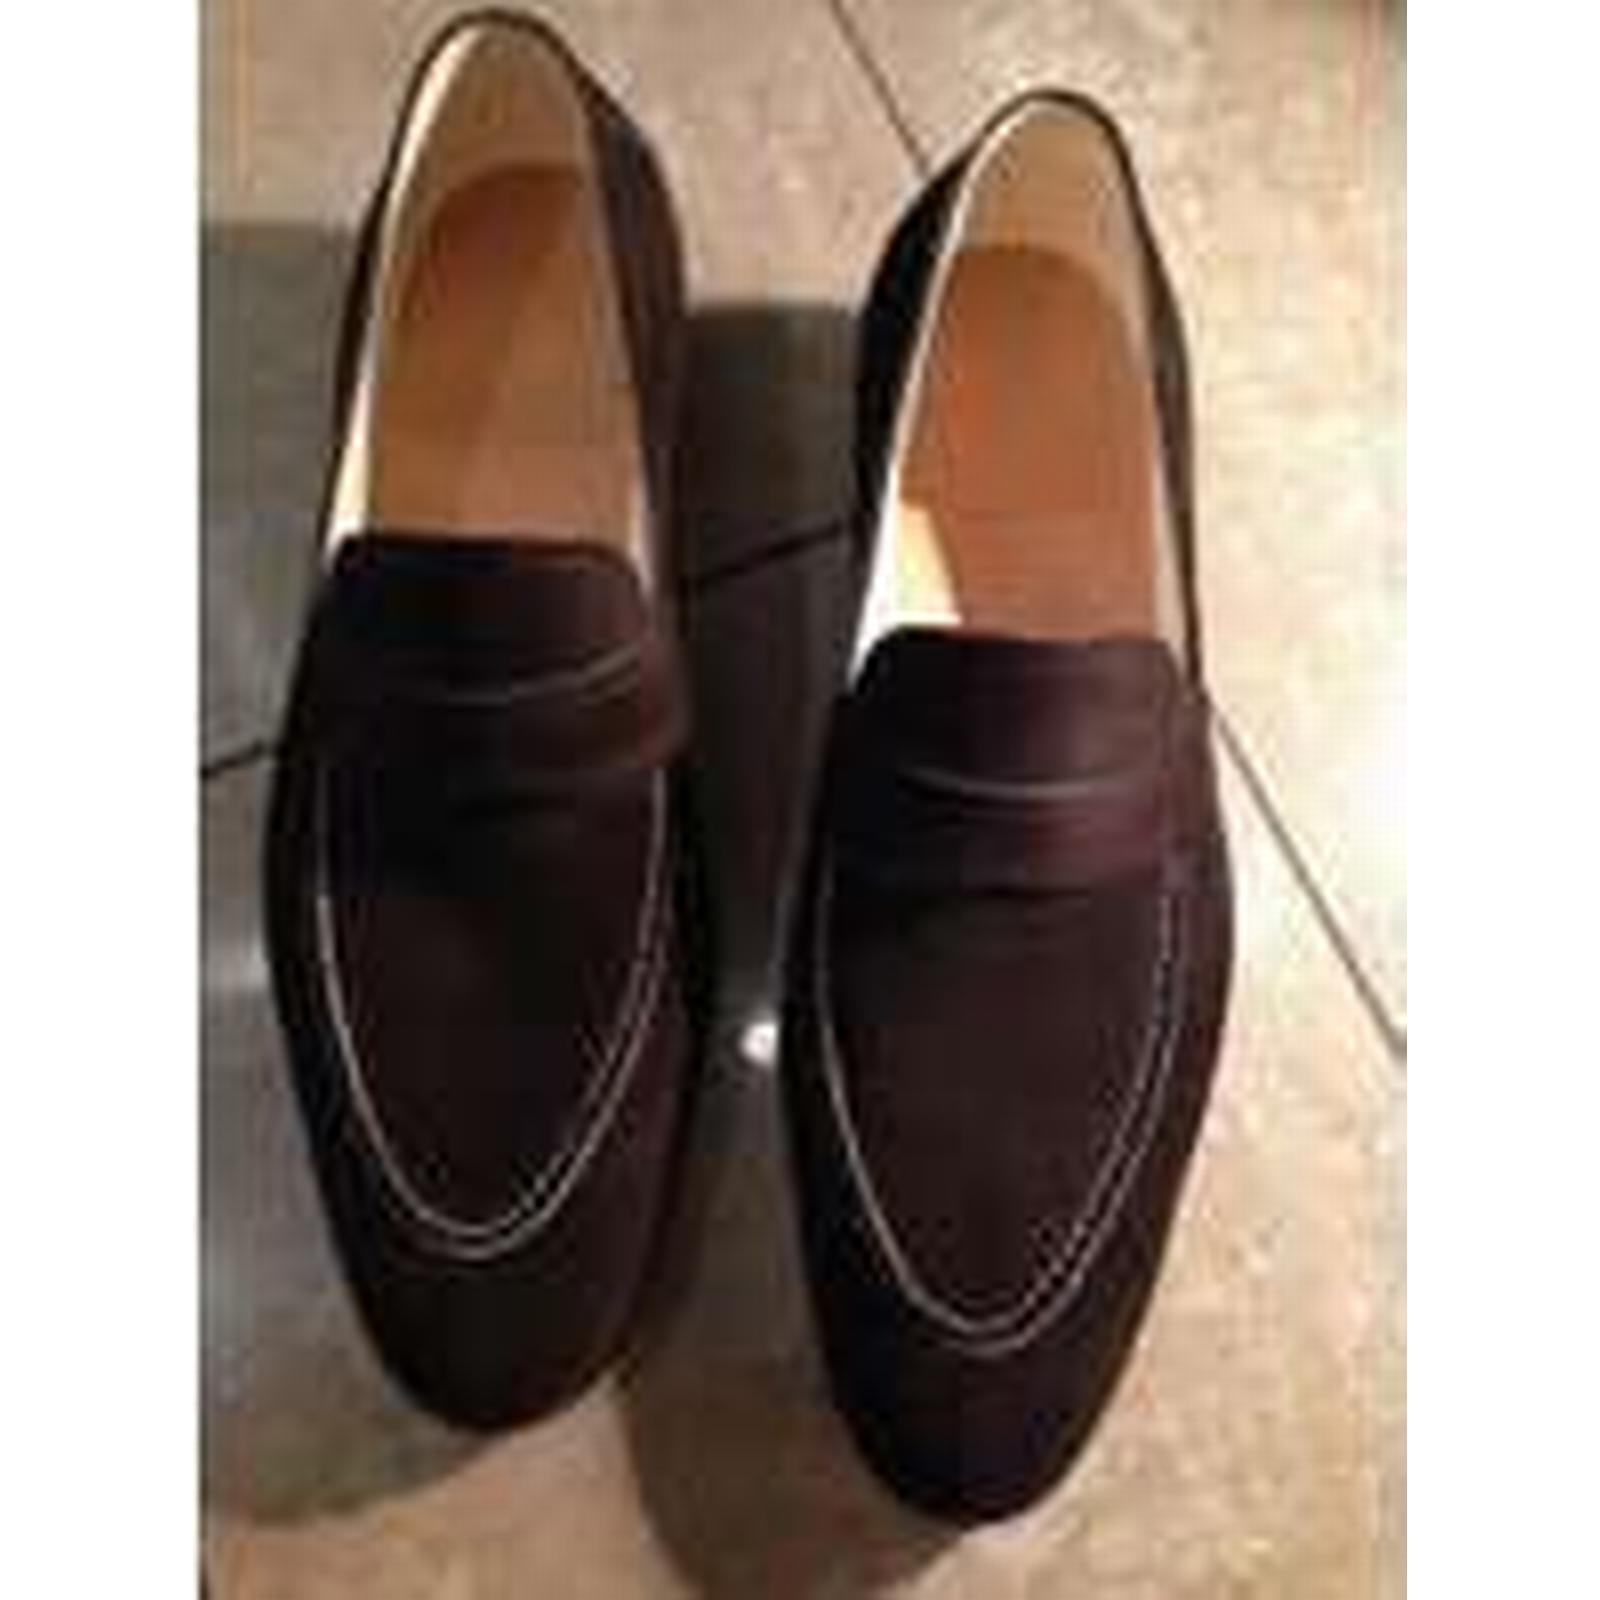 Bonanza (Global) New Handmade Men brown suede shoes, Moccasins, Men suede leather shoes, suede Shoes for men 246b12